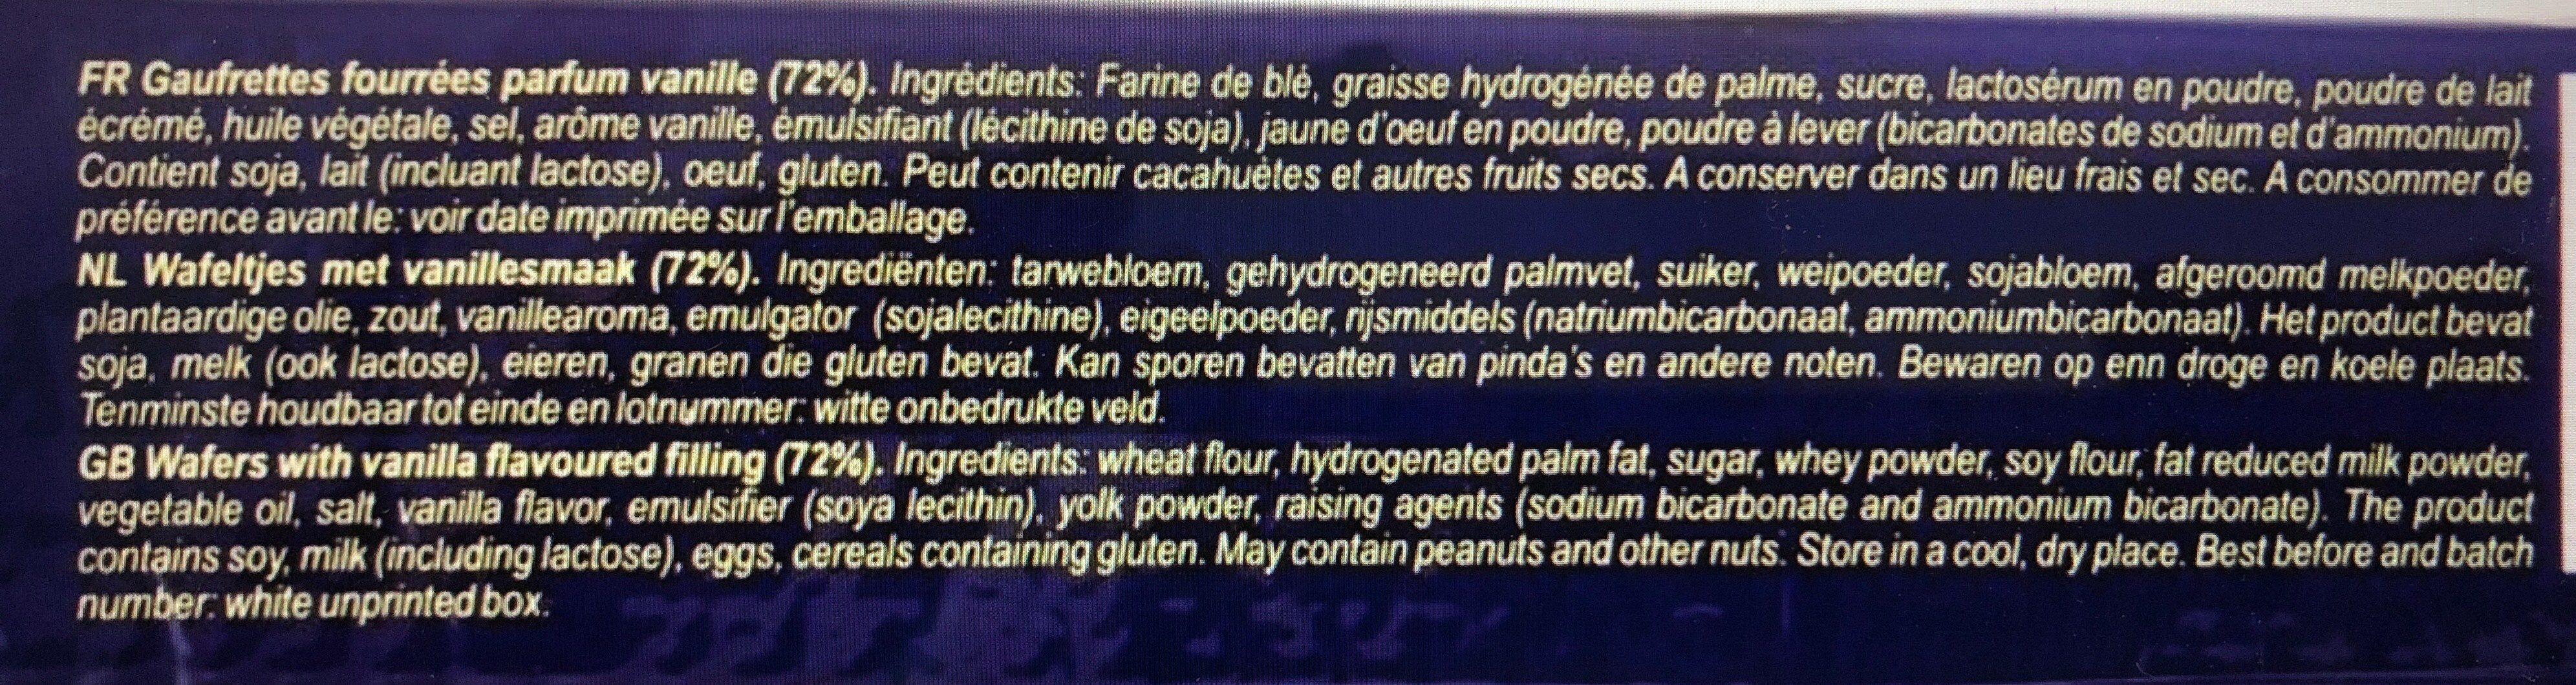 Gaufrettes Fourrées Parfum Vanille - Ingredienti - fr